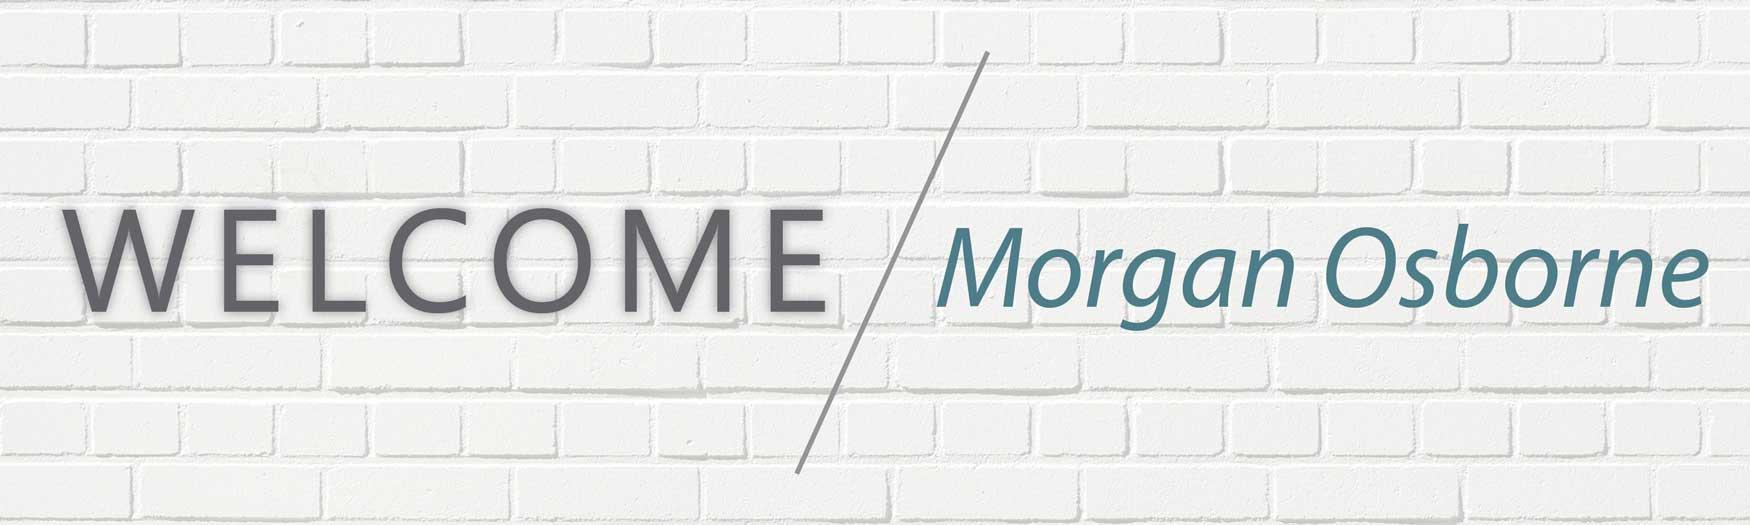 Qk4 Welcomes Morgan Osborne